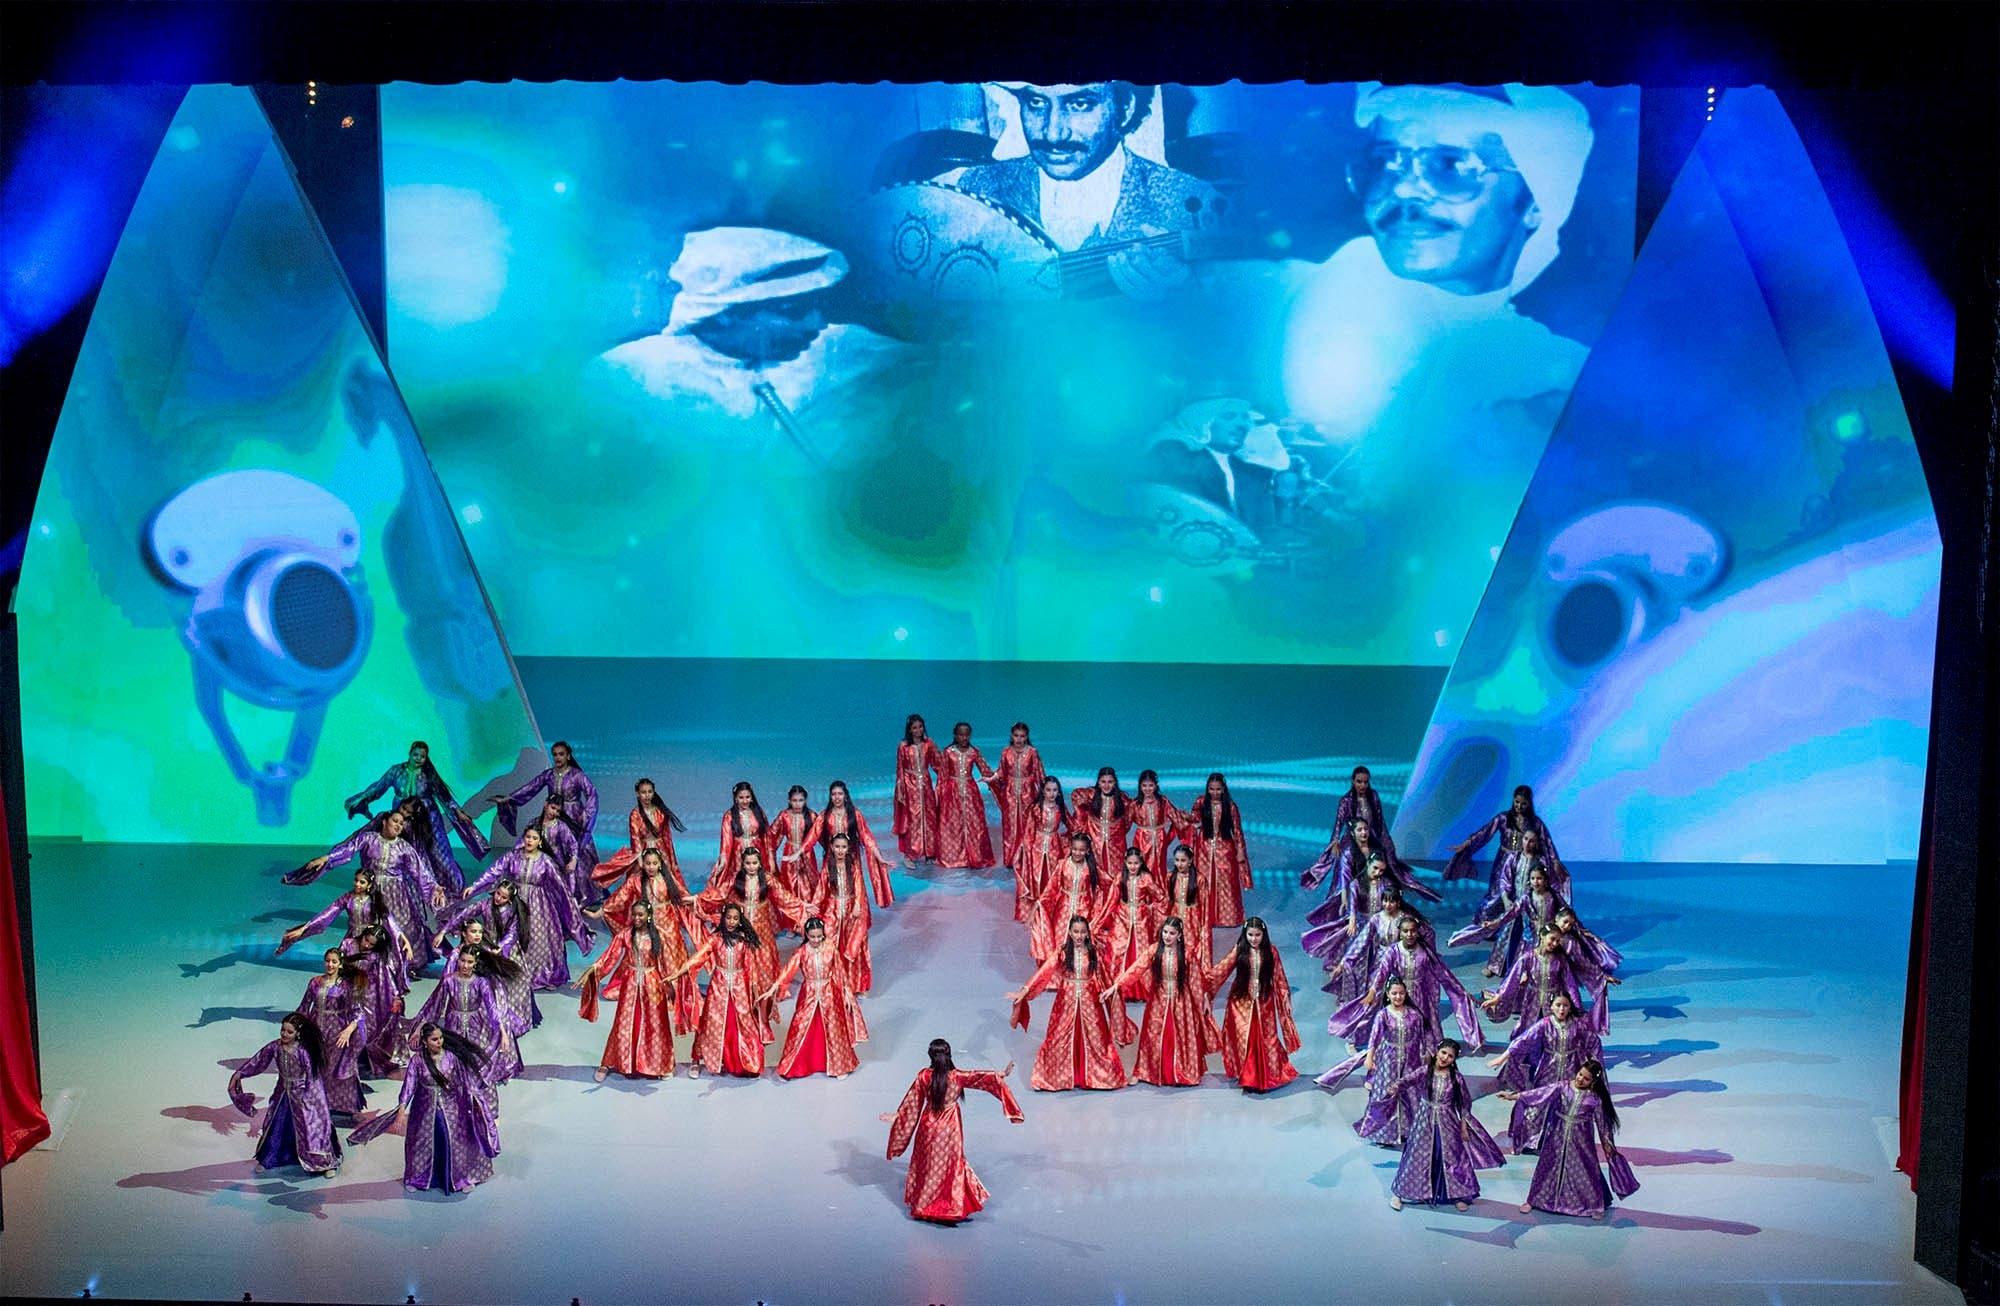 Saudi King Salman attends live performances at Kuwait's Opera House